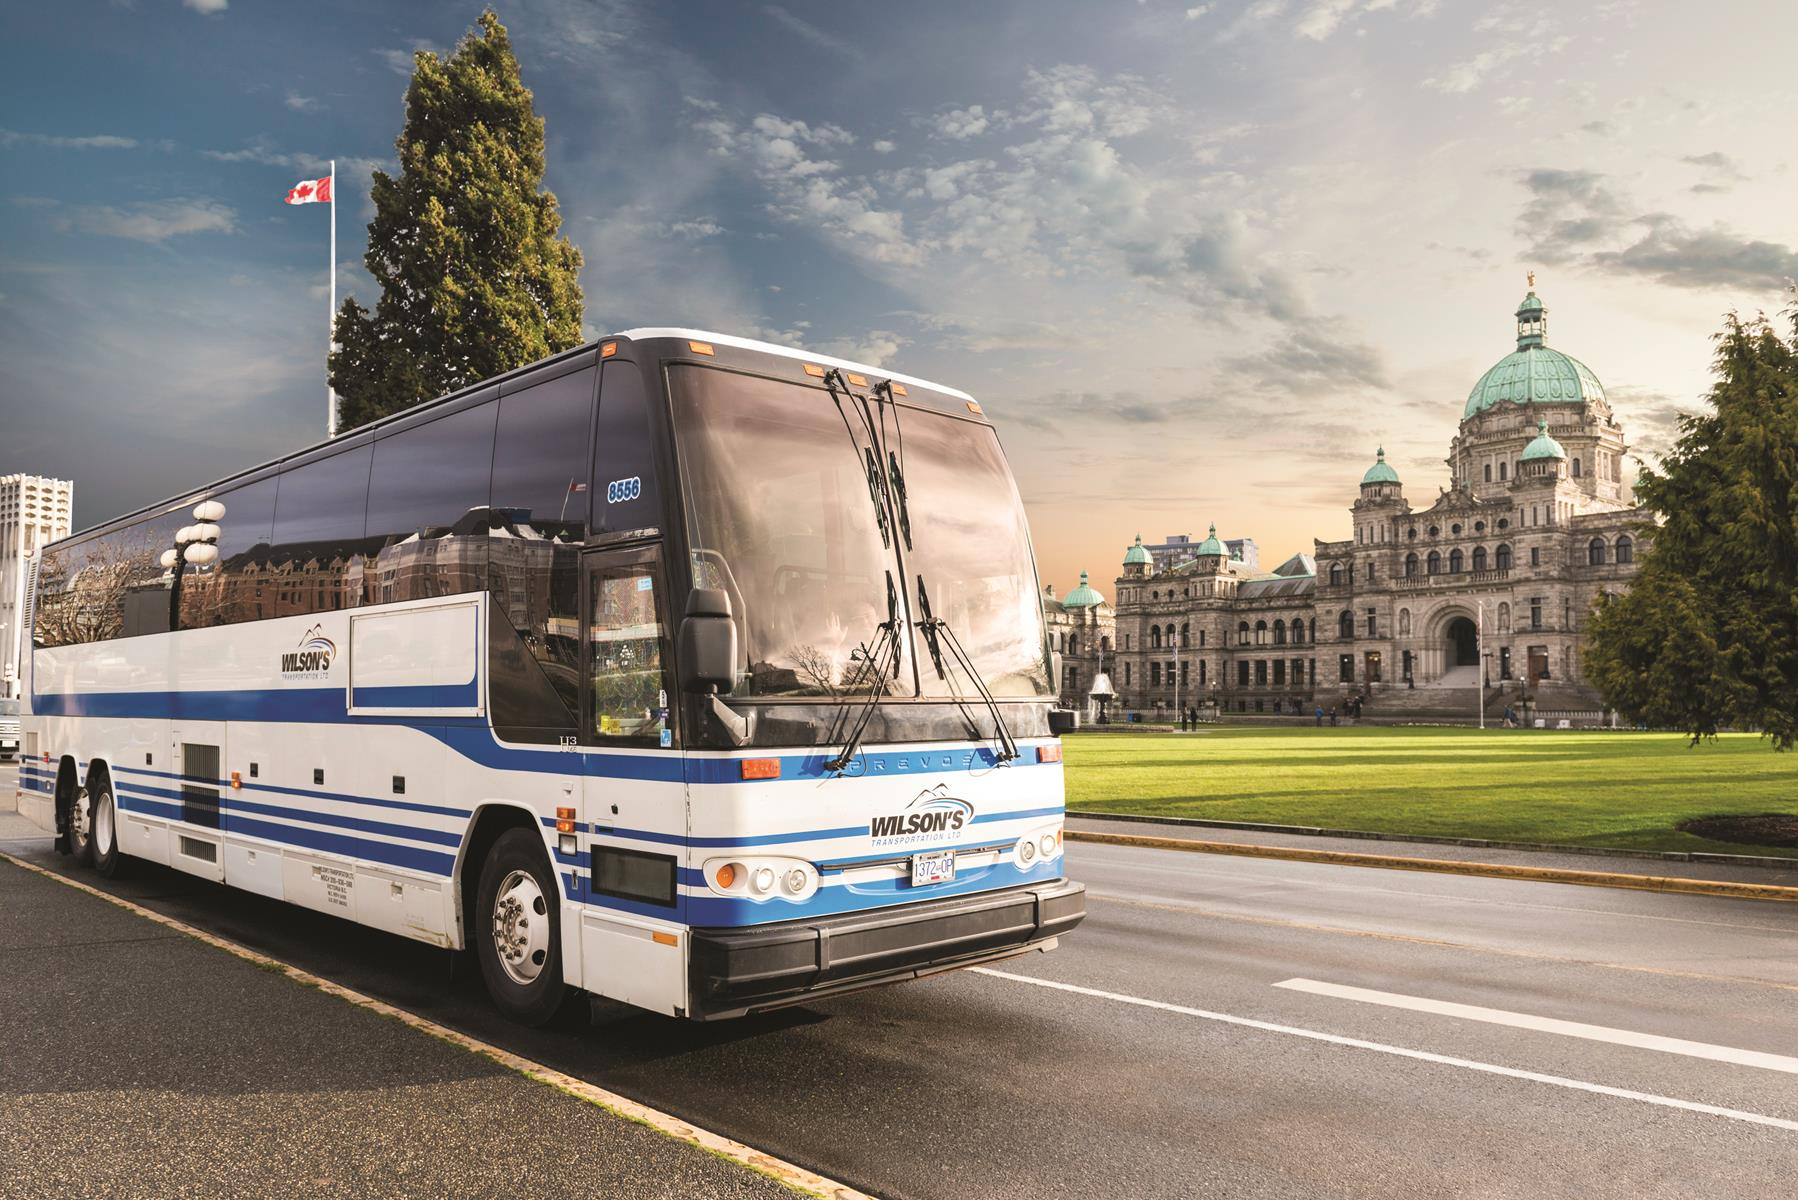 Victoria - Wilsons Bus at Victoria Legislature Building - Canadian Vacation